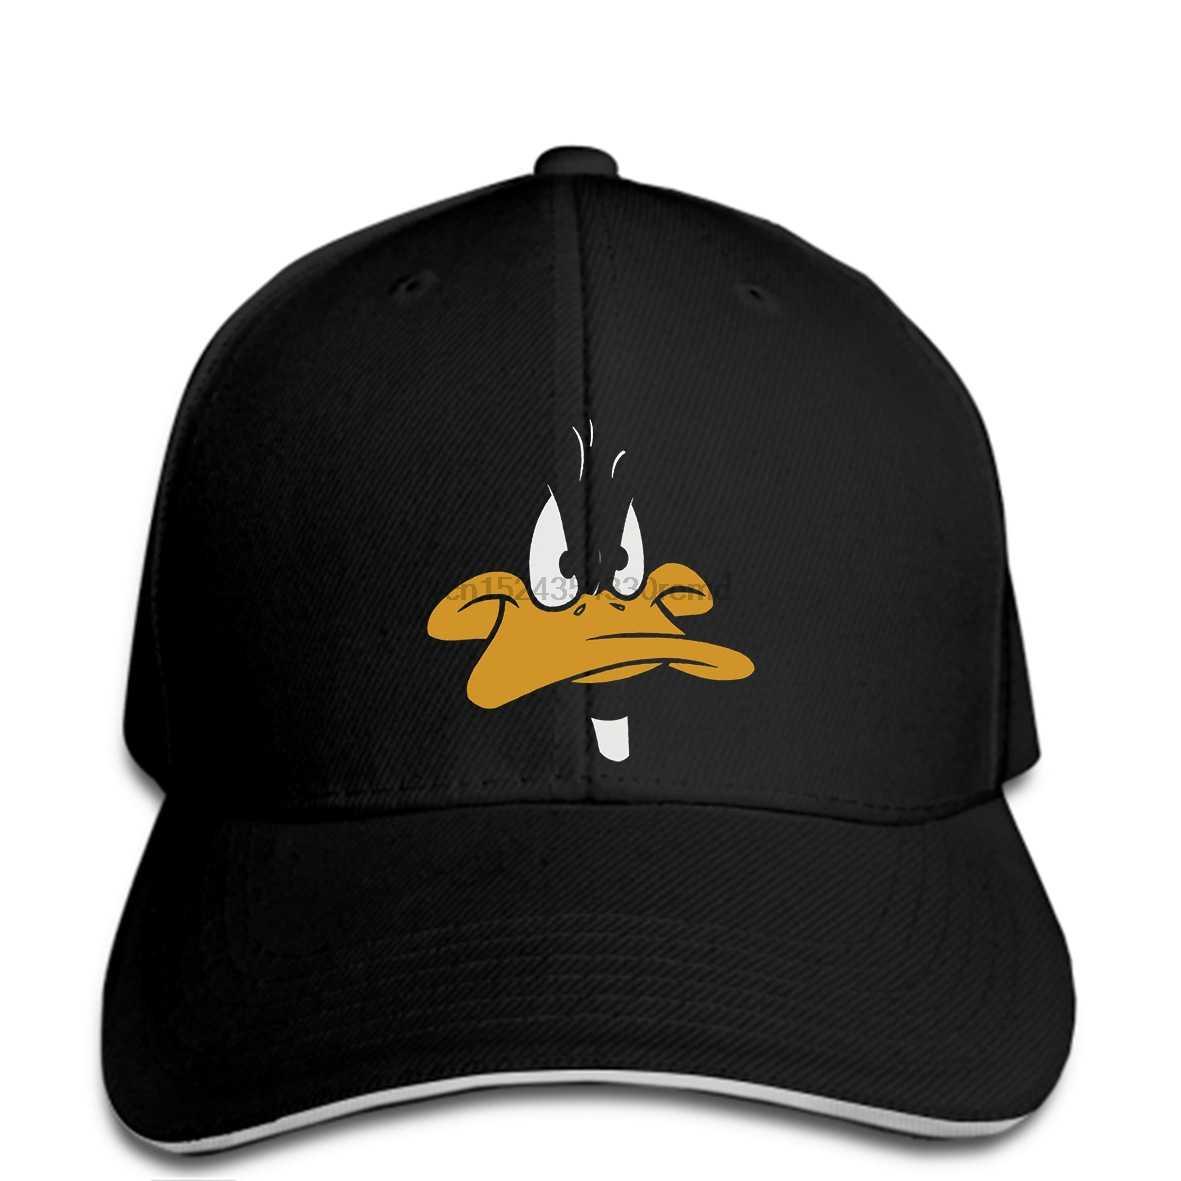 c4f4e1c029e hip hop Baseball caps Funny Men hat cap Black Details About Looney Tunes  Men s Daffy Duck